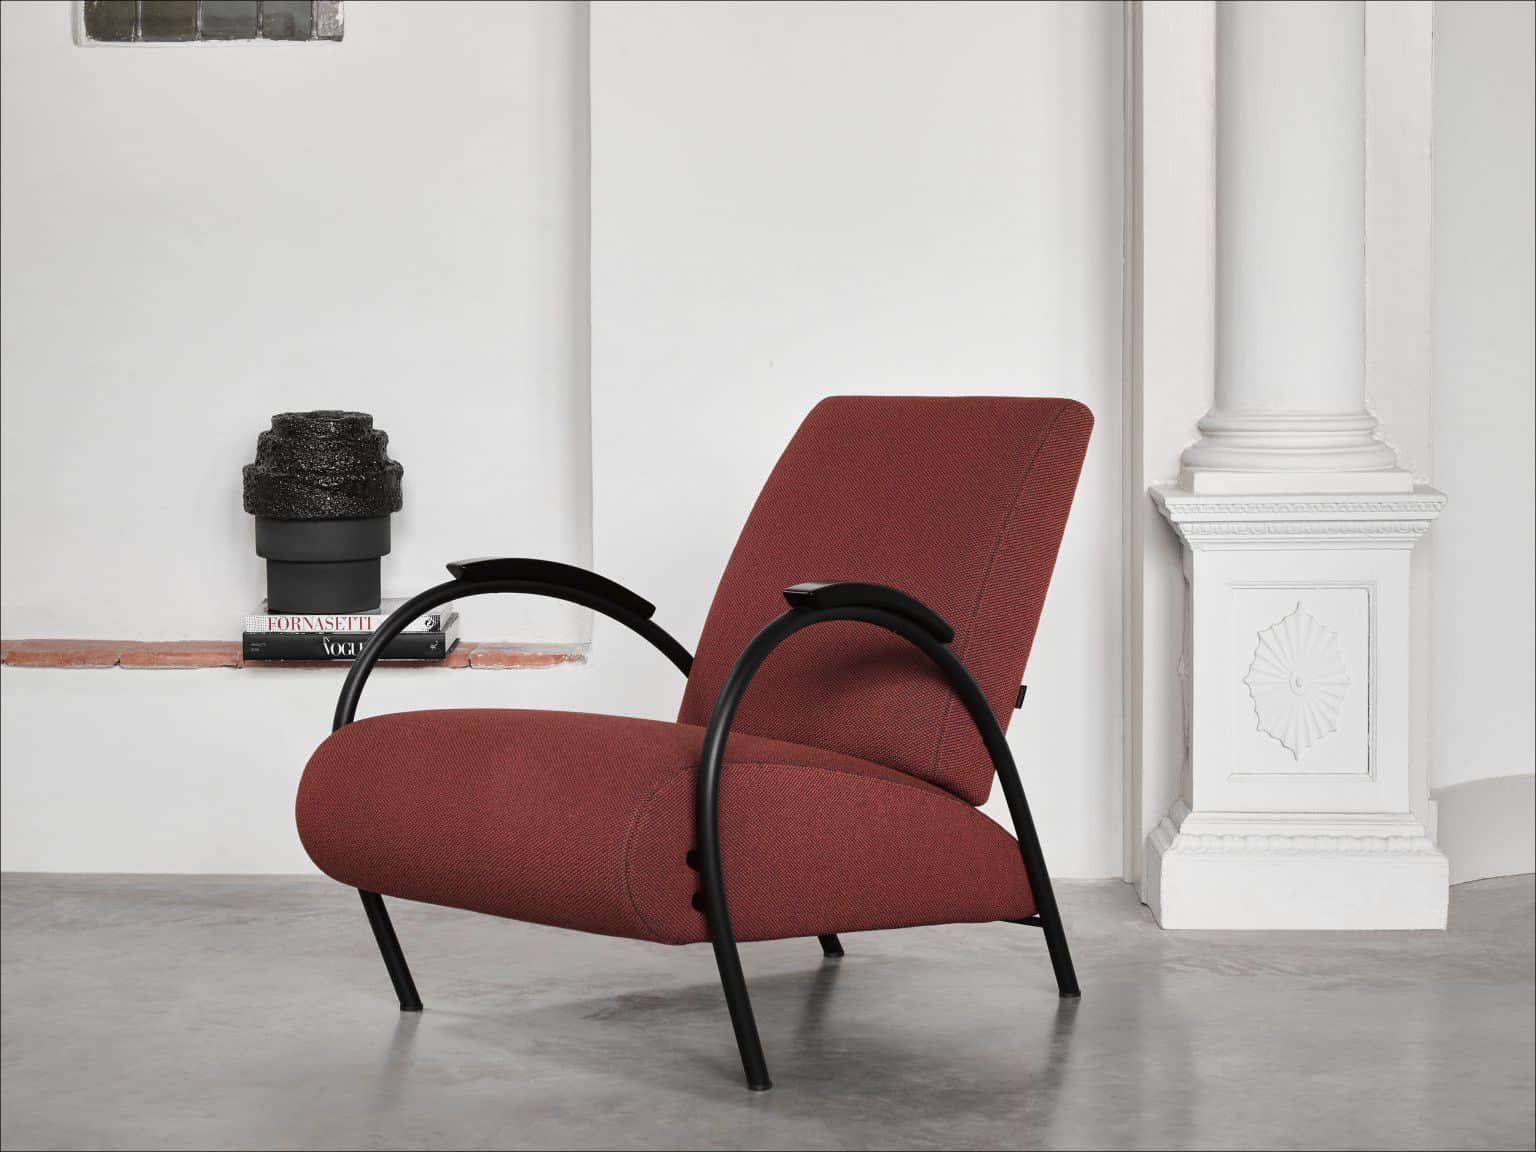 Gelderland fauteuil 5770 sf